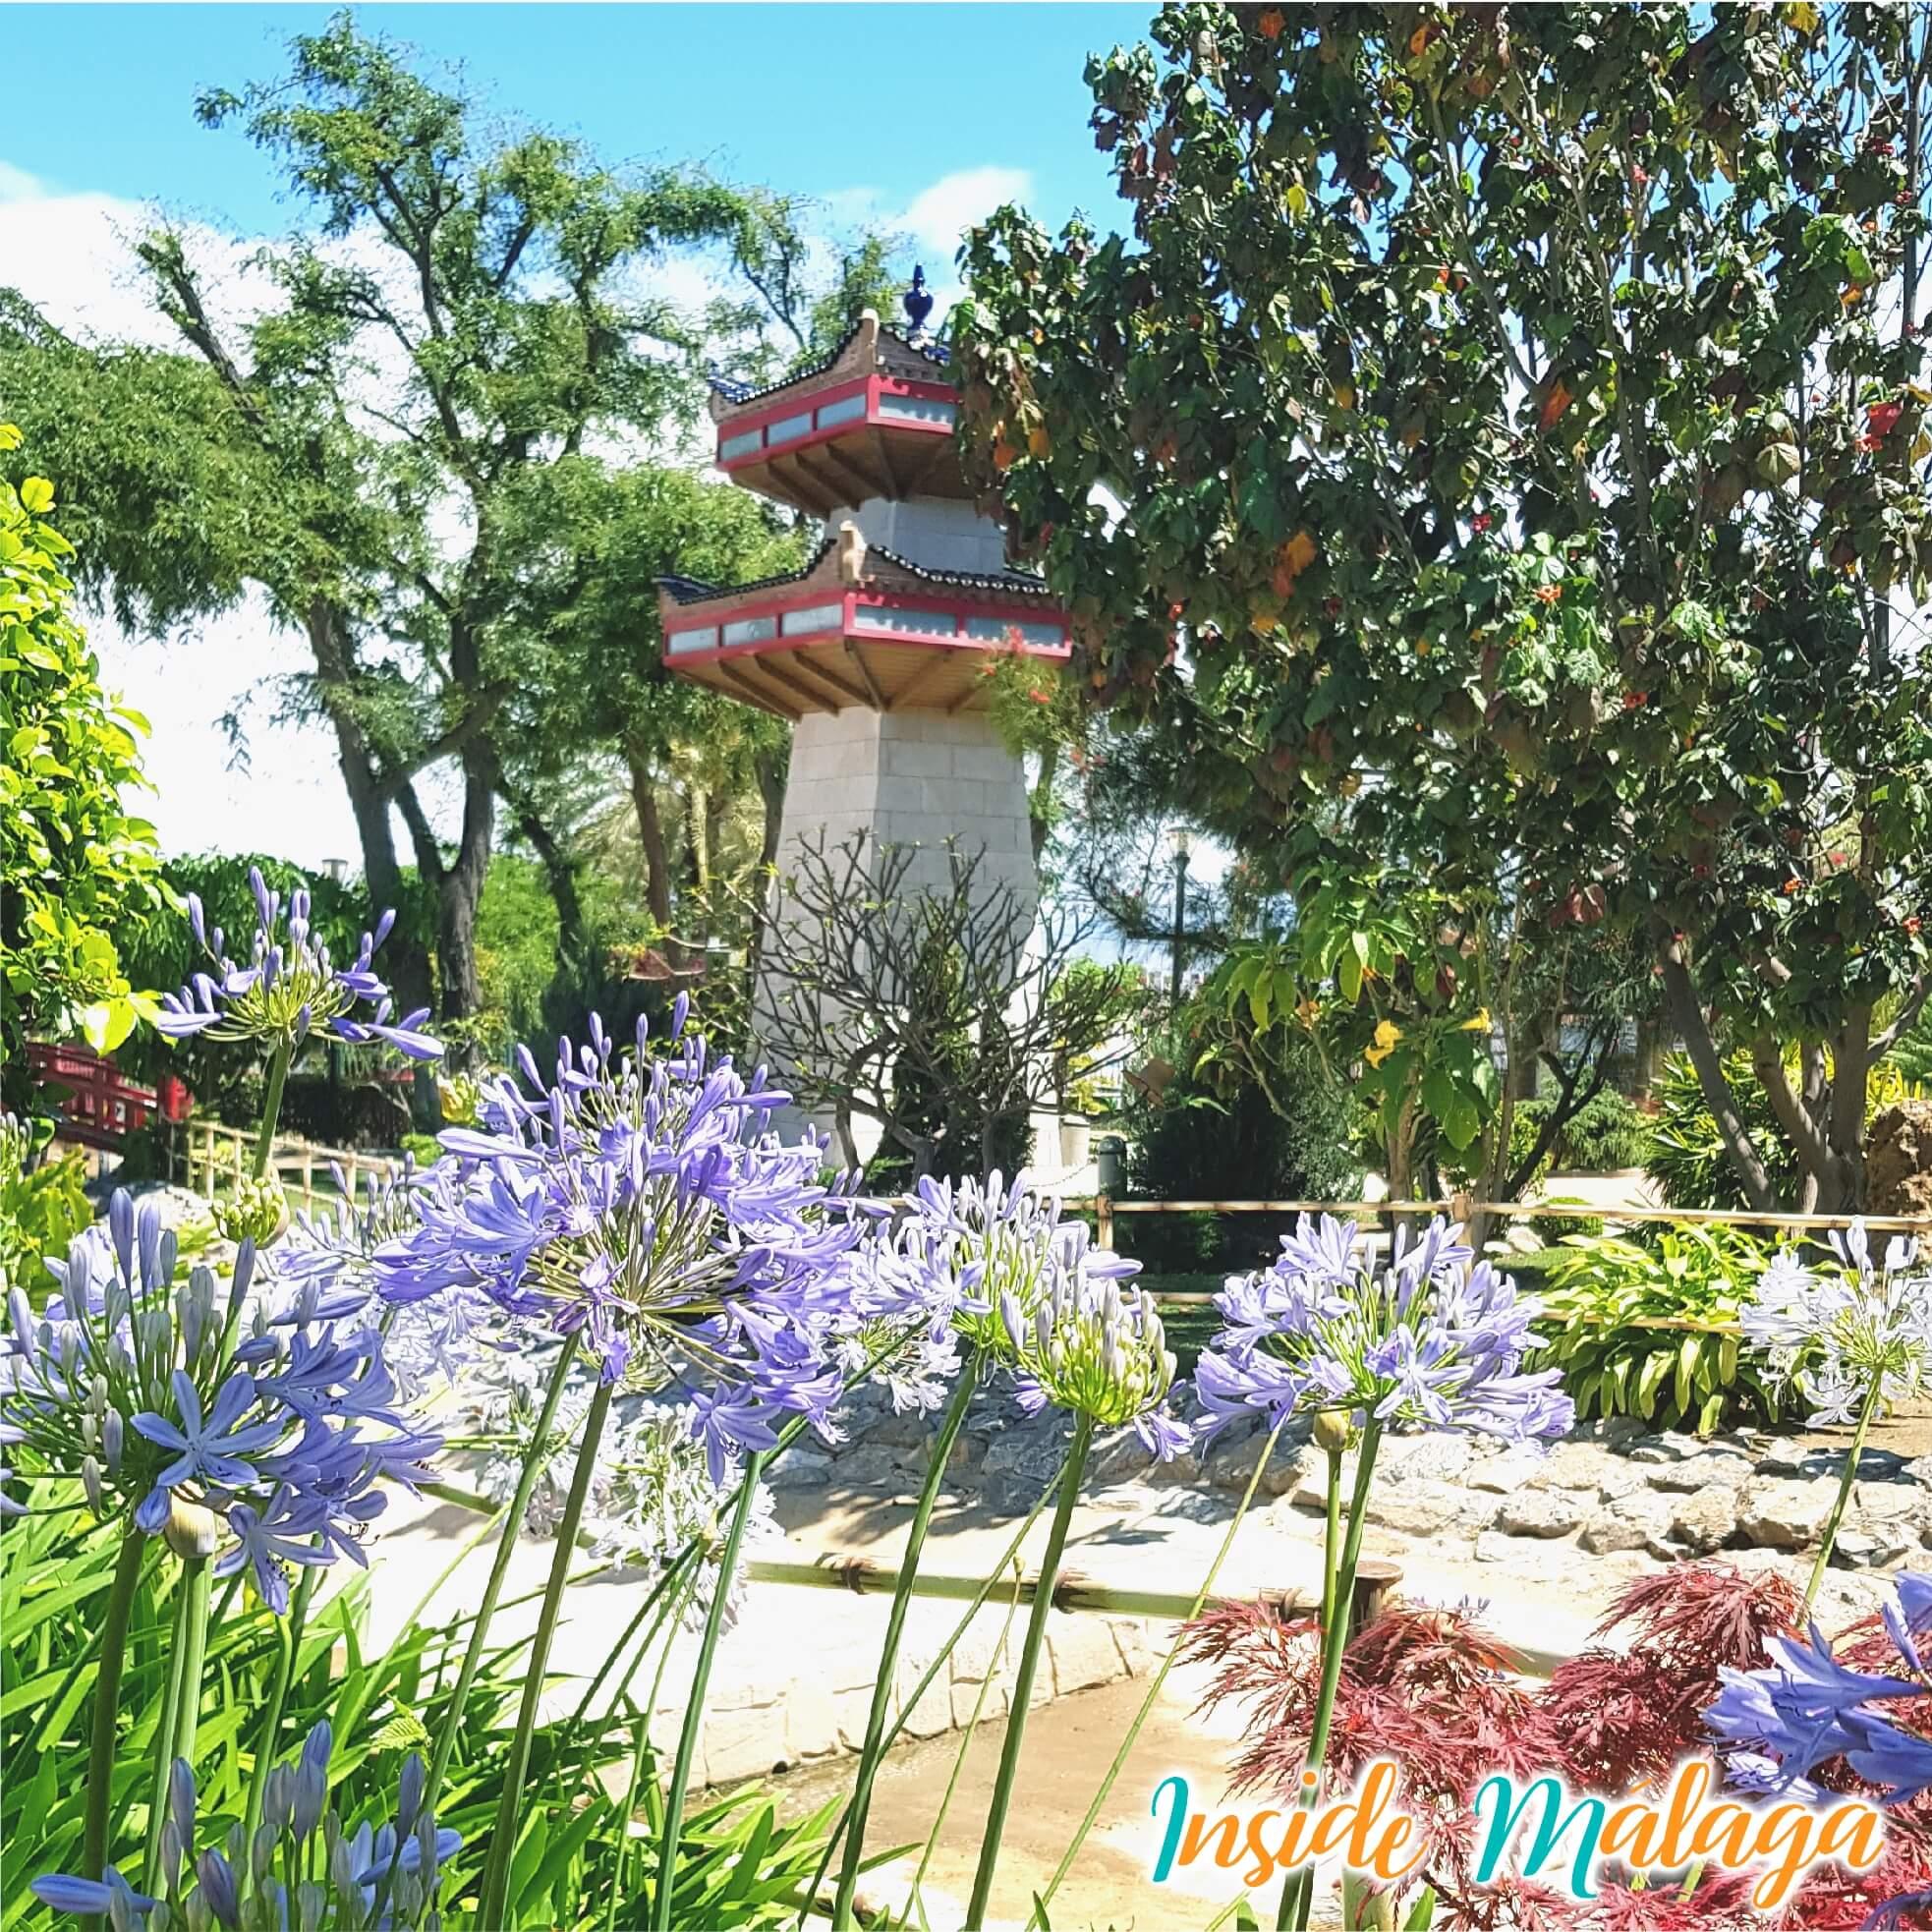 Väl älskad orientalisk trädgård